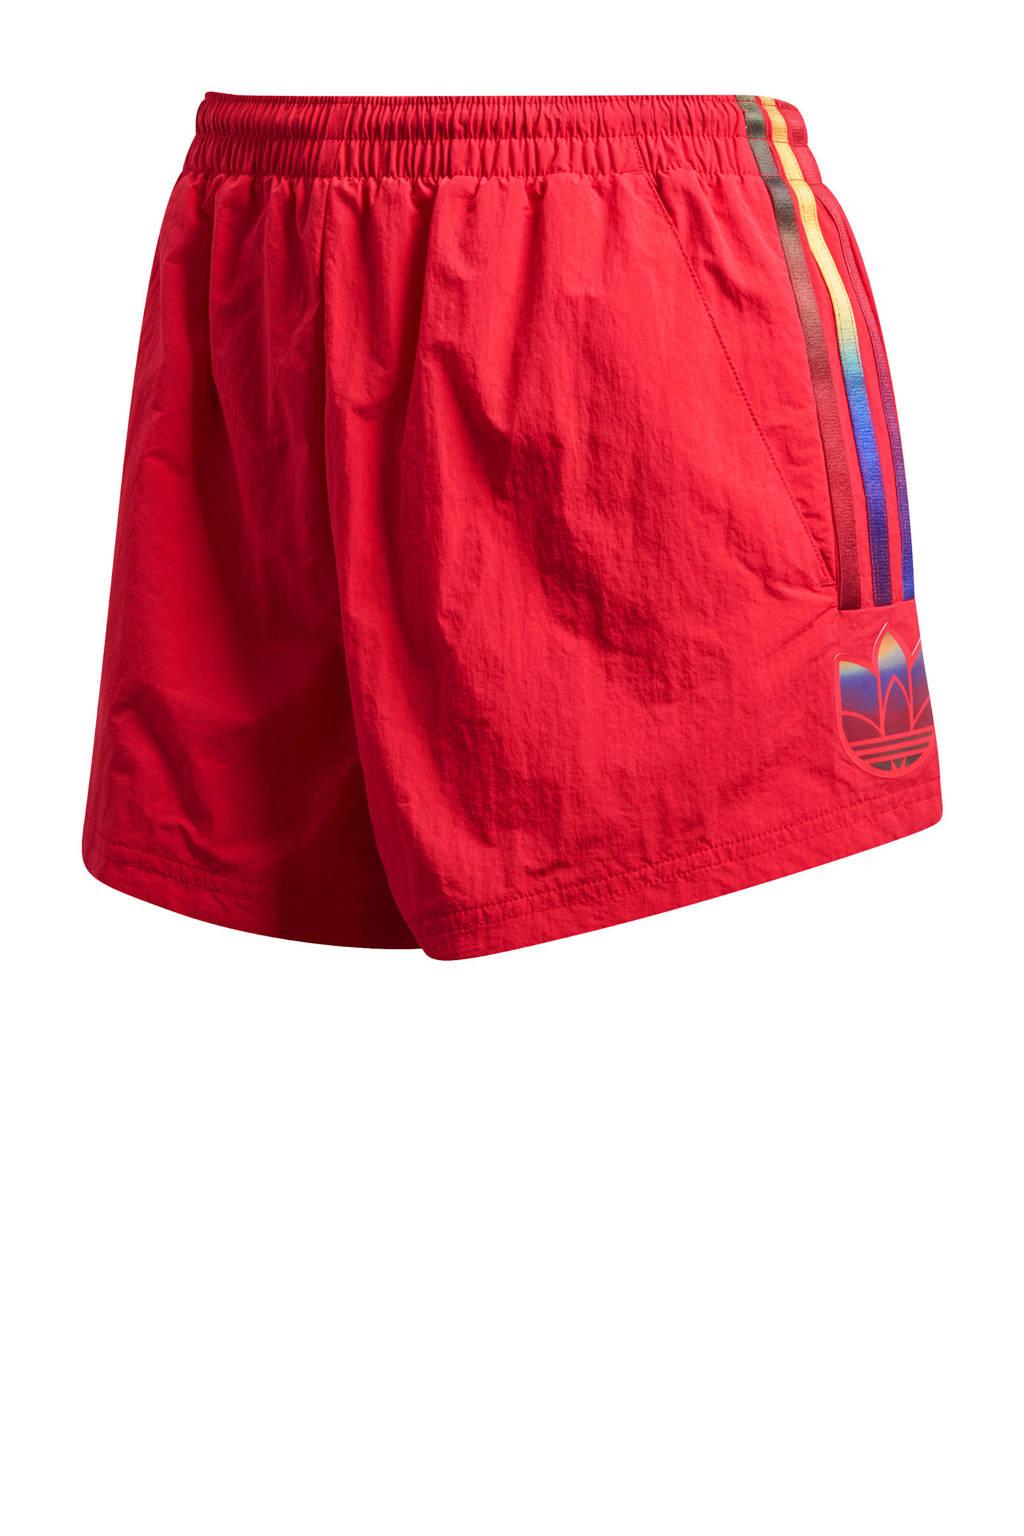 adidas Originals short rood, Rood